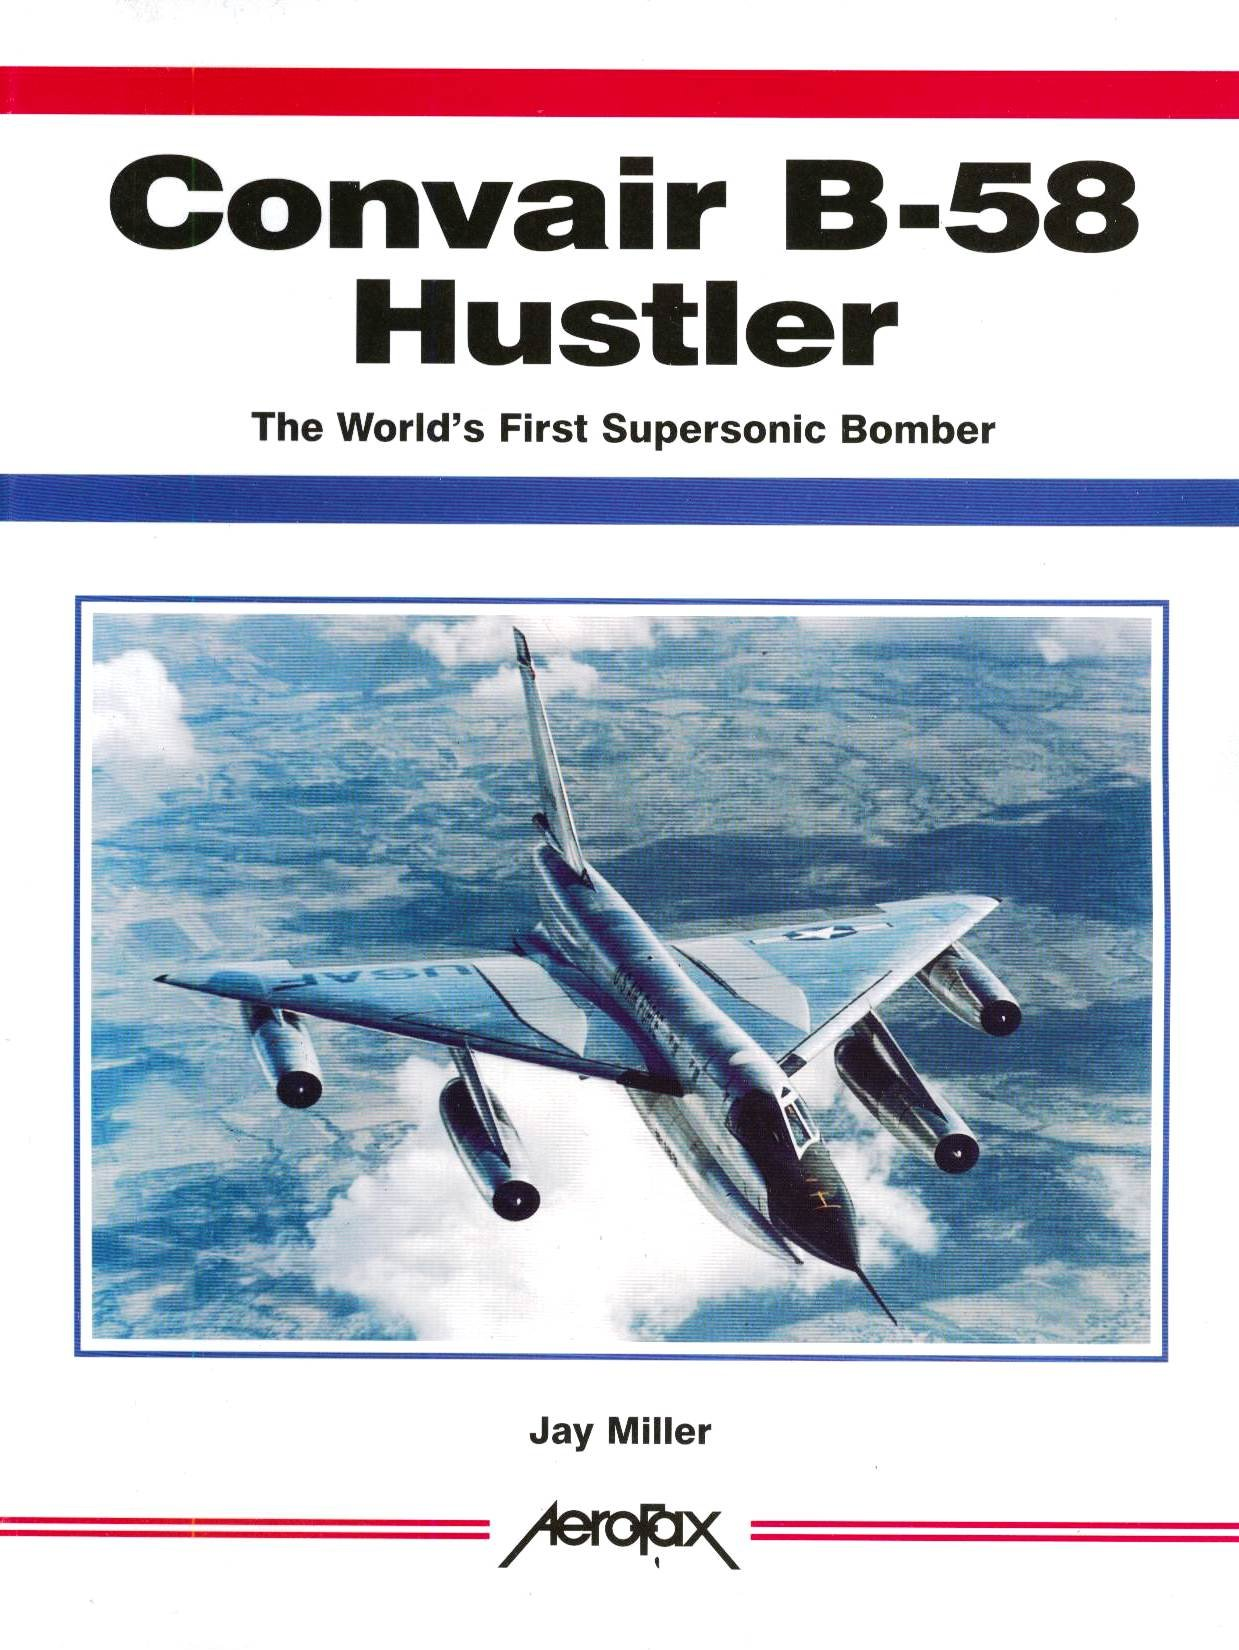 Jay miller convair b-58 hustler